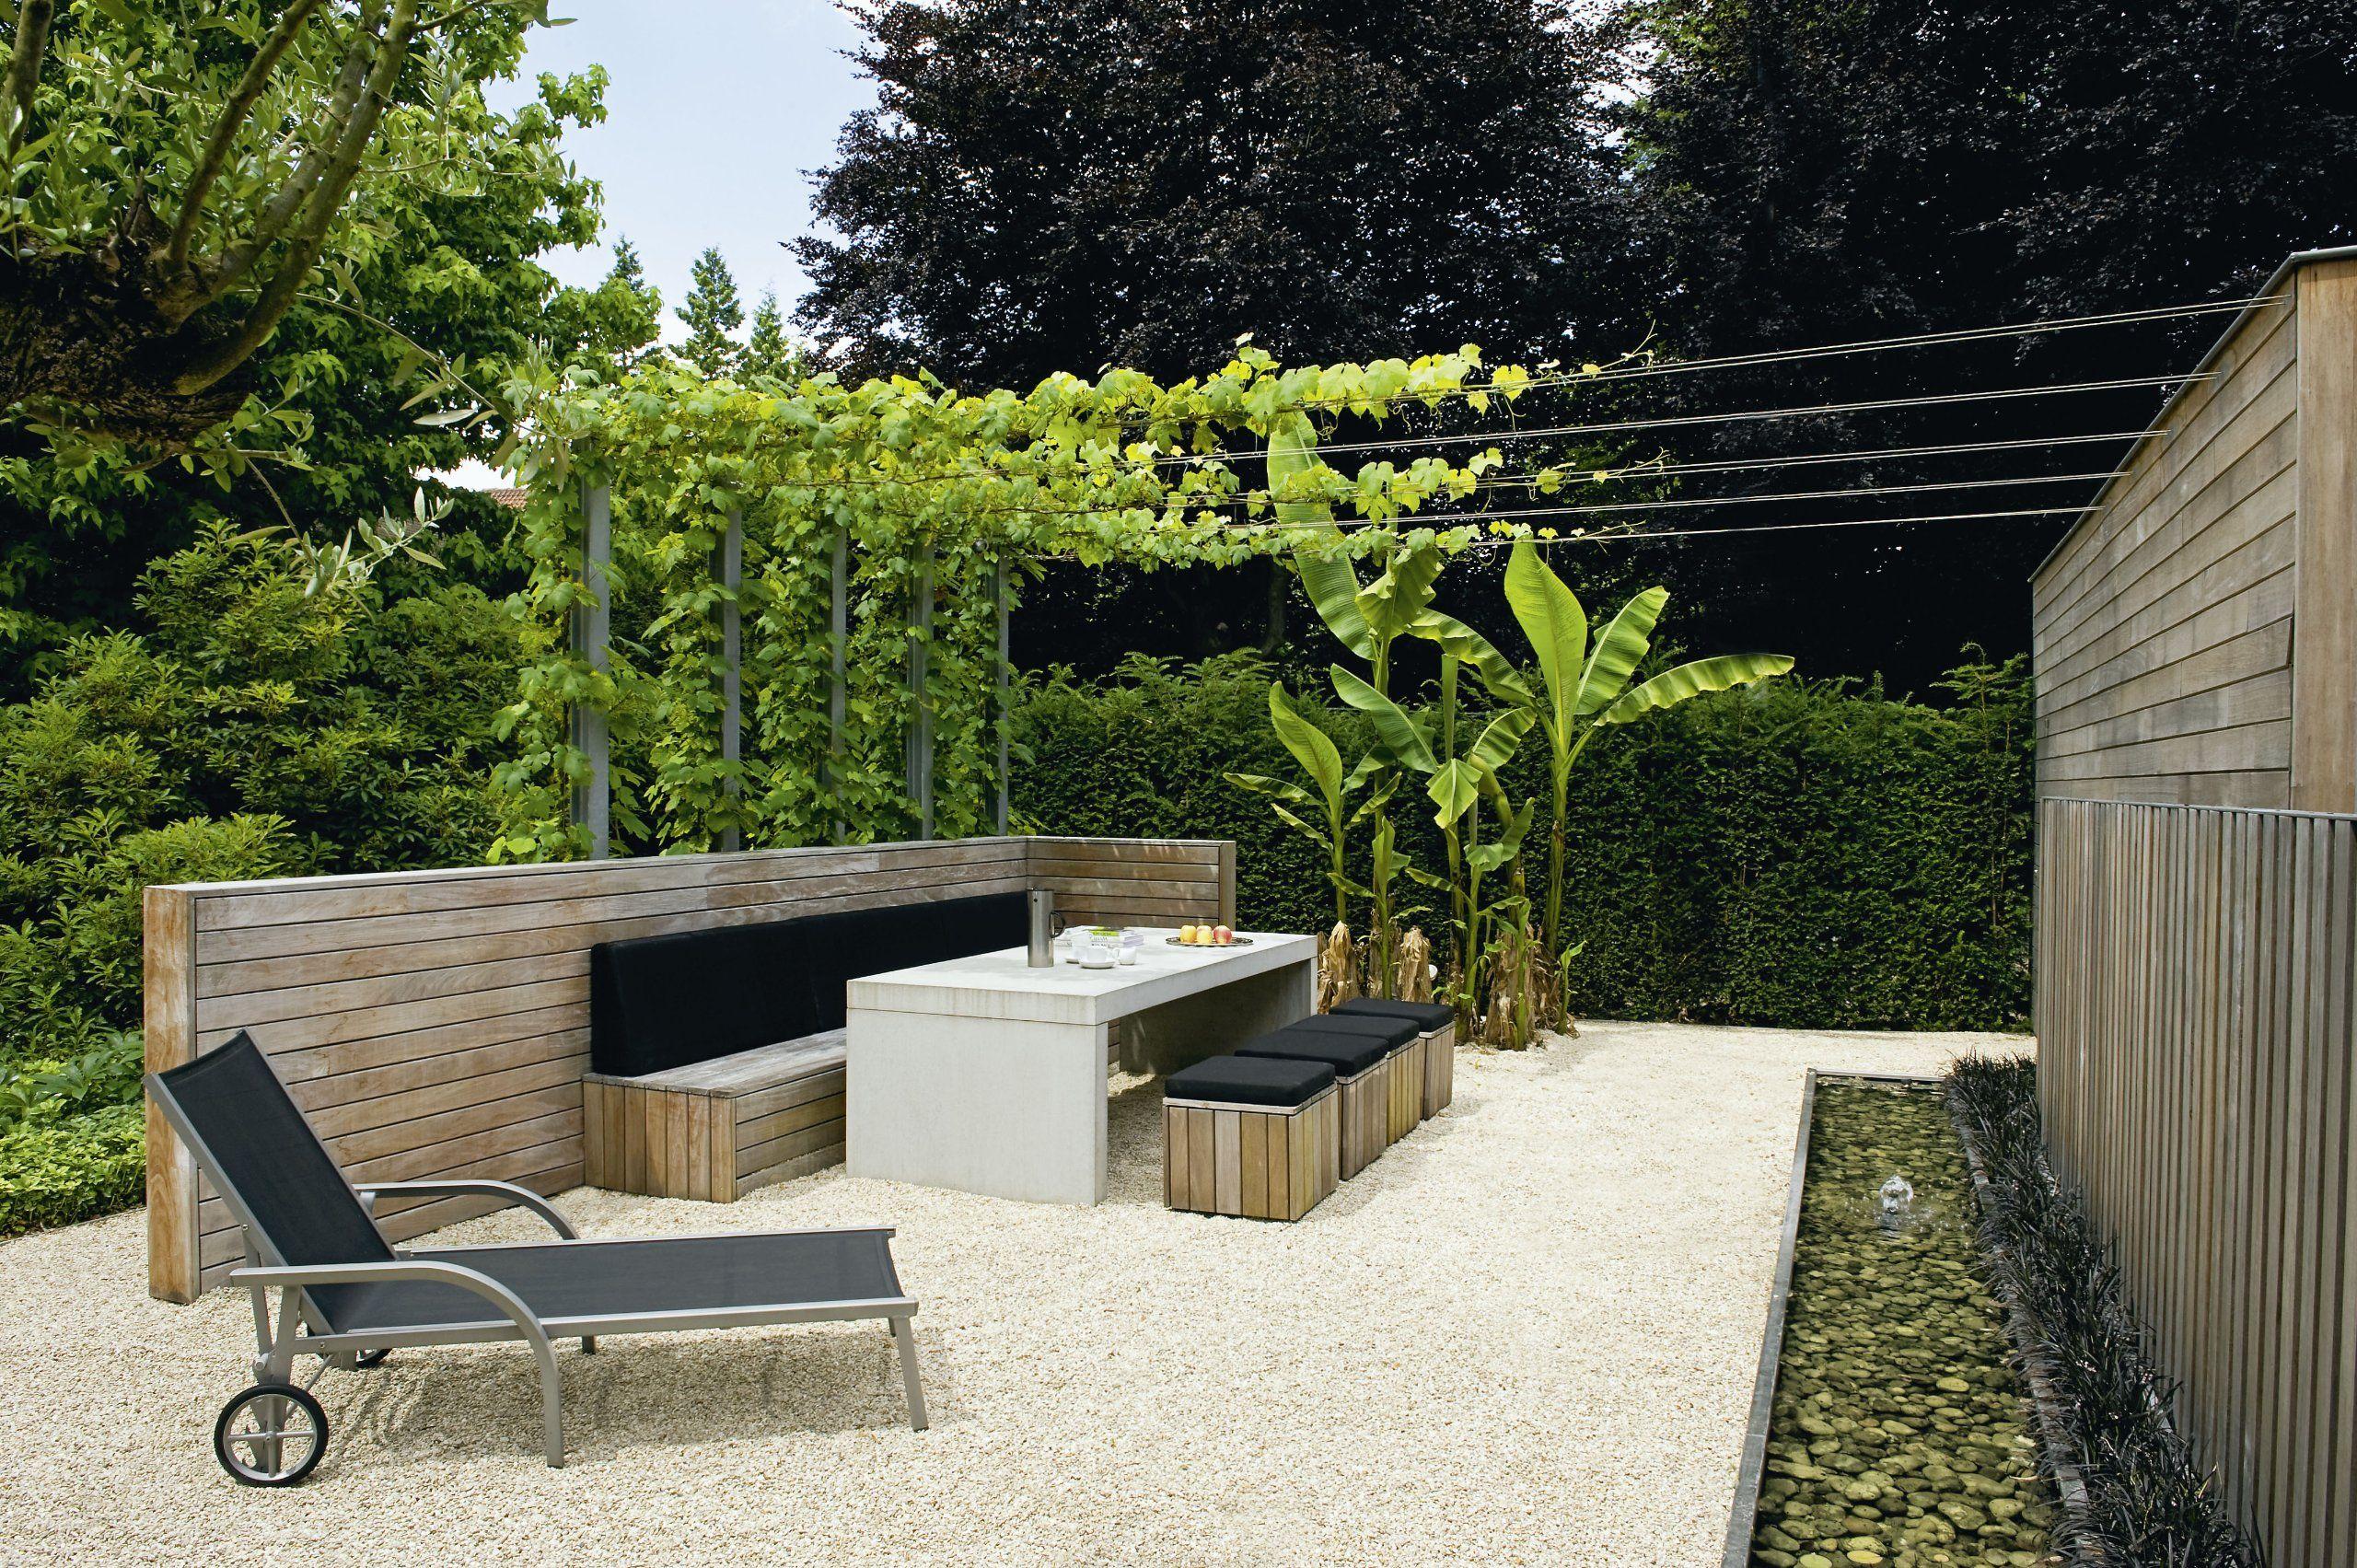 reihenhausgarten modern – leamarieravotti, Garten ideen gestaltung